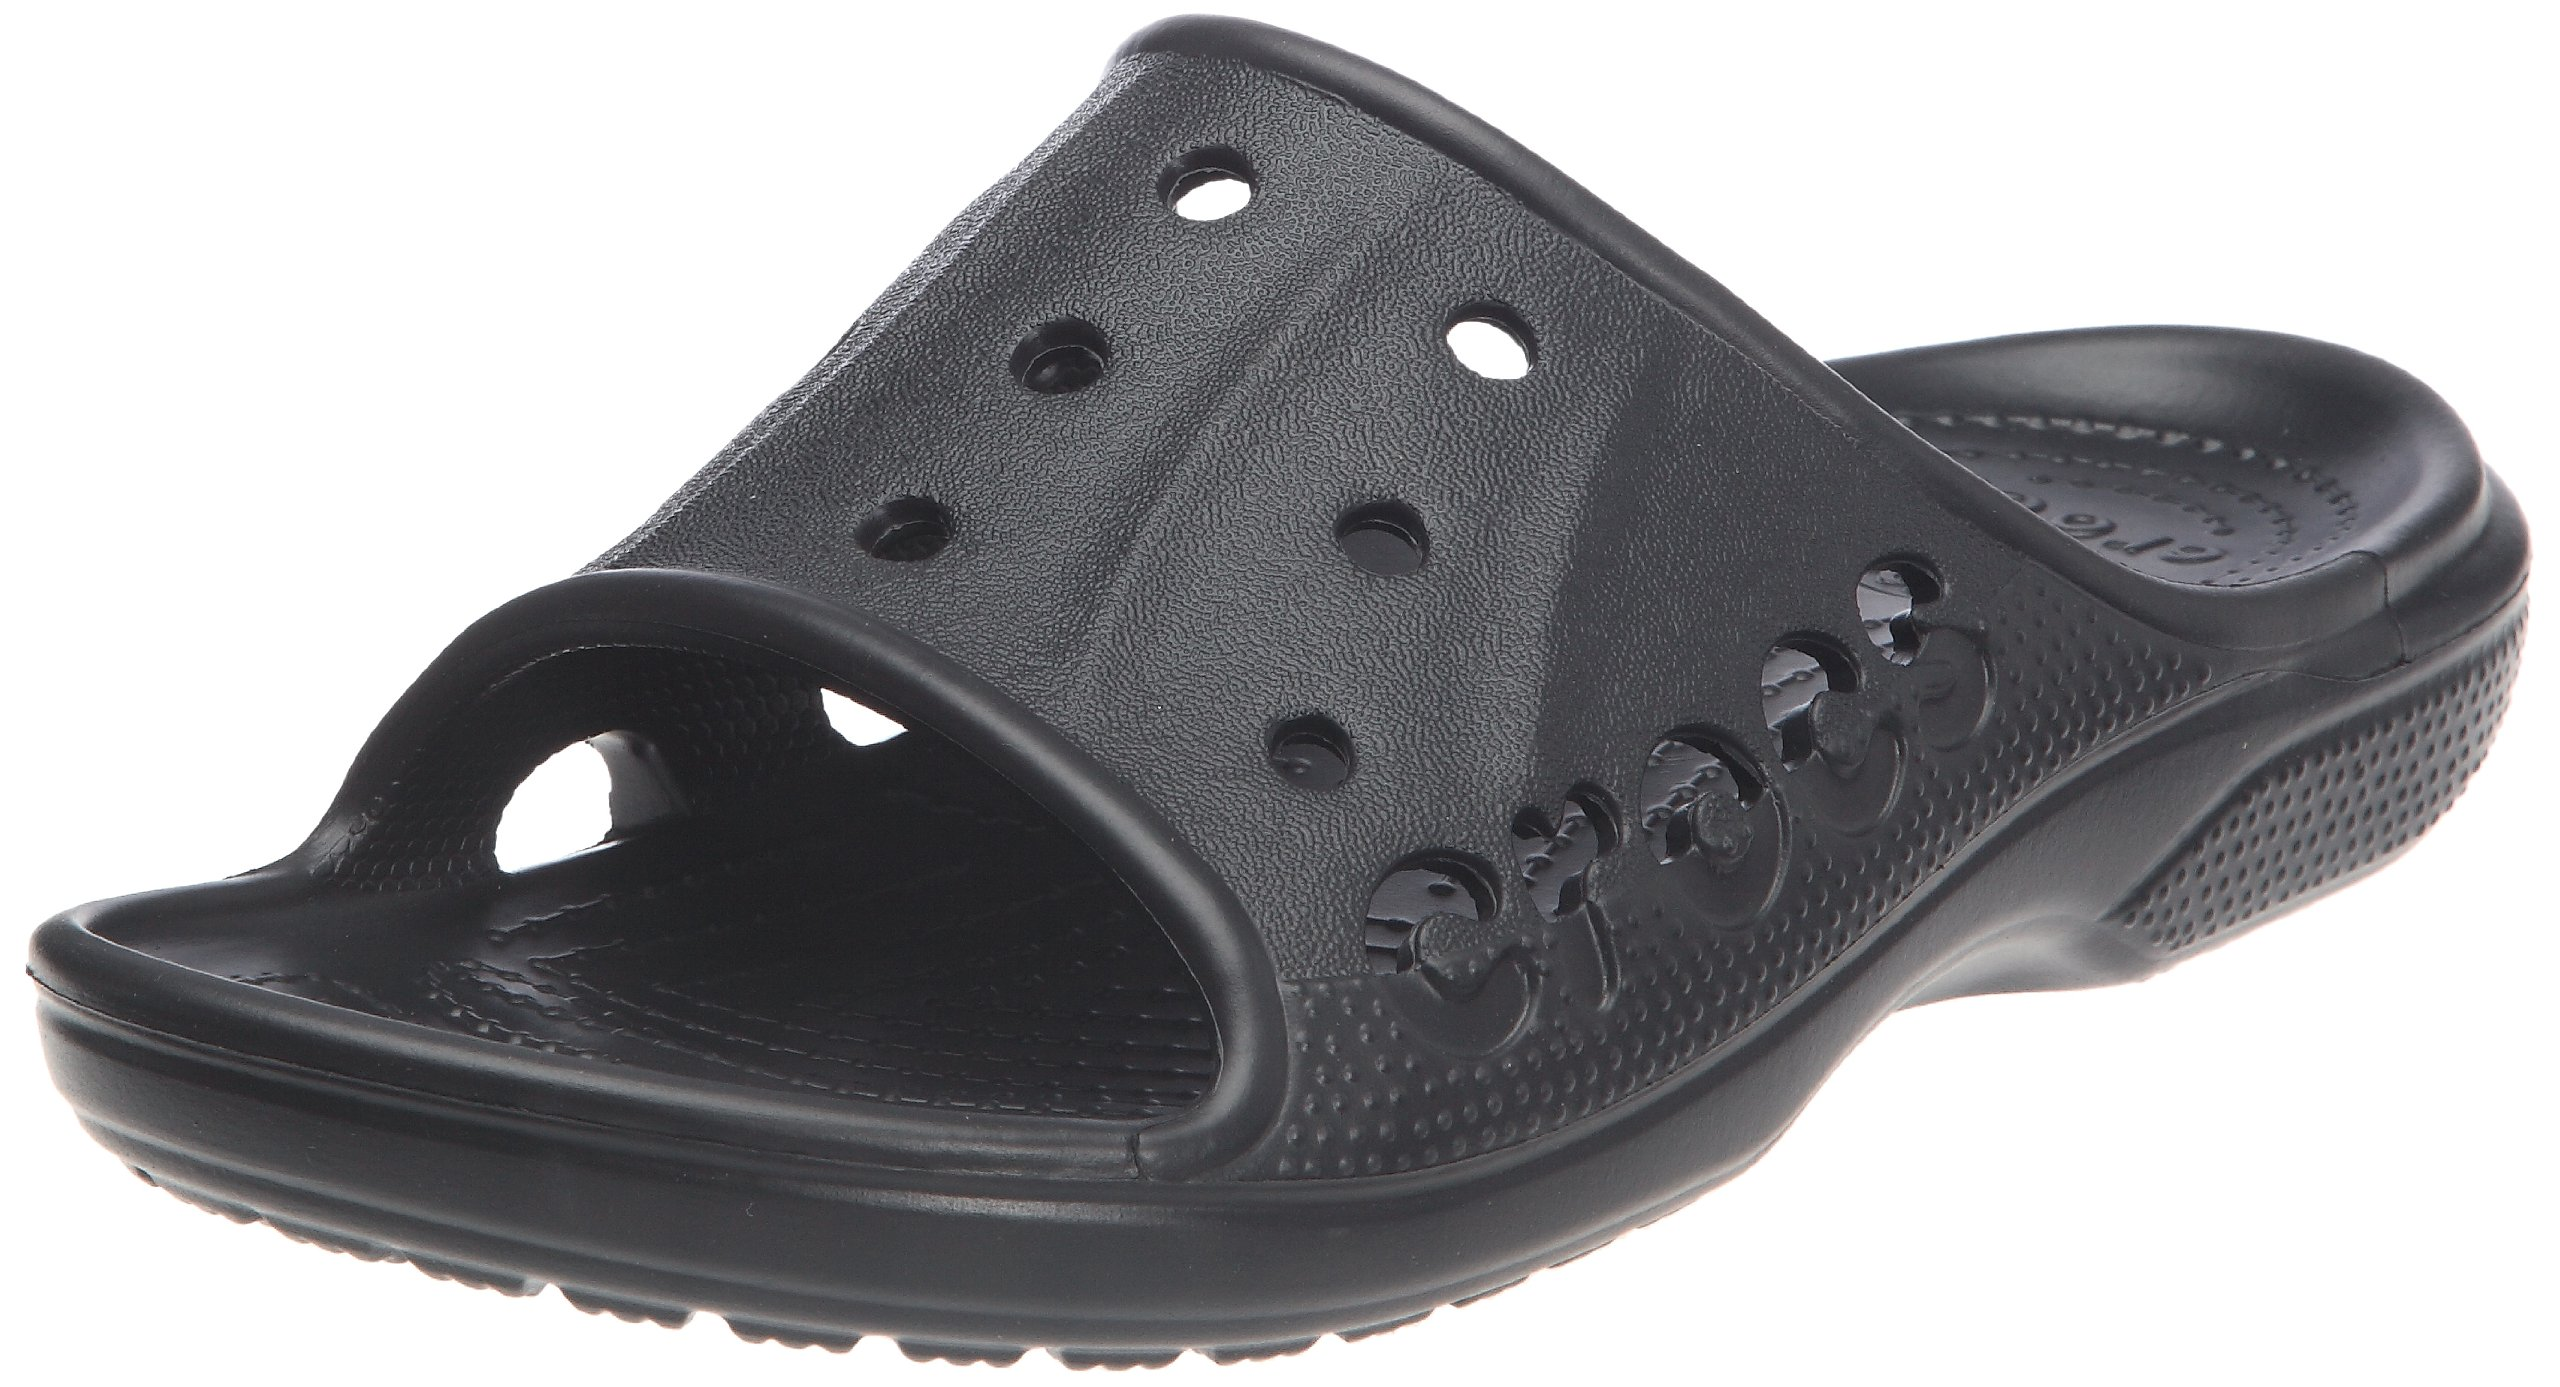 Crocs Unisex Baya Slide,Black,6 M US Men/8 M US Women